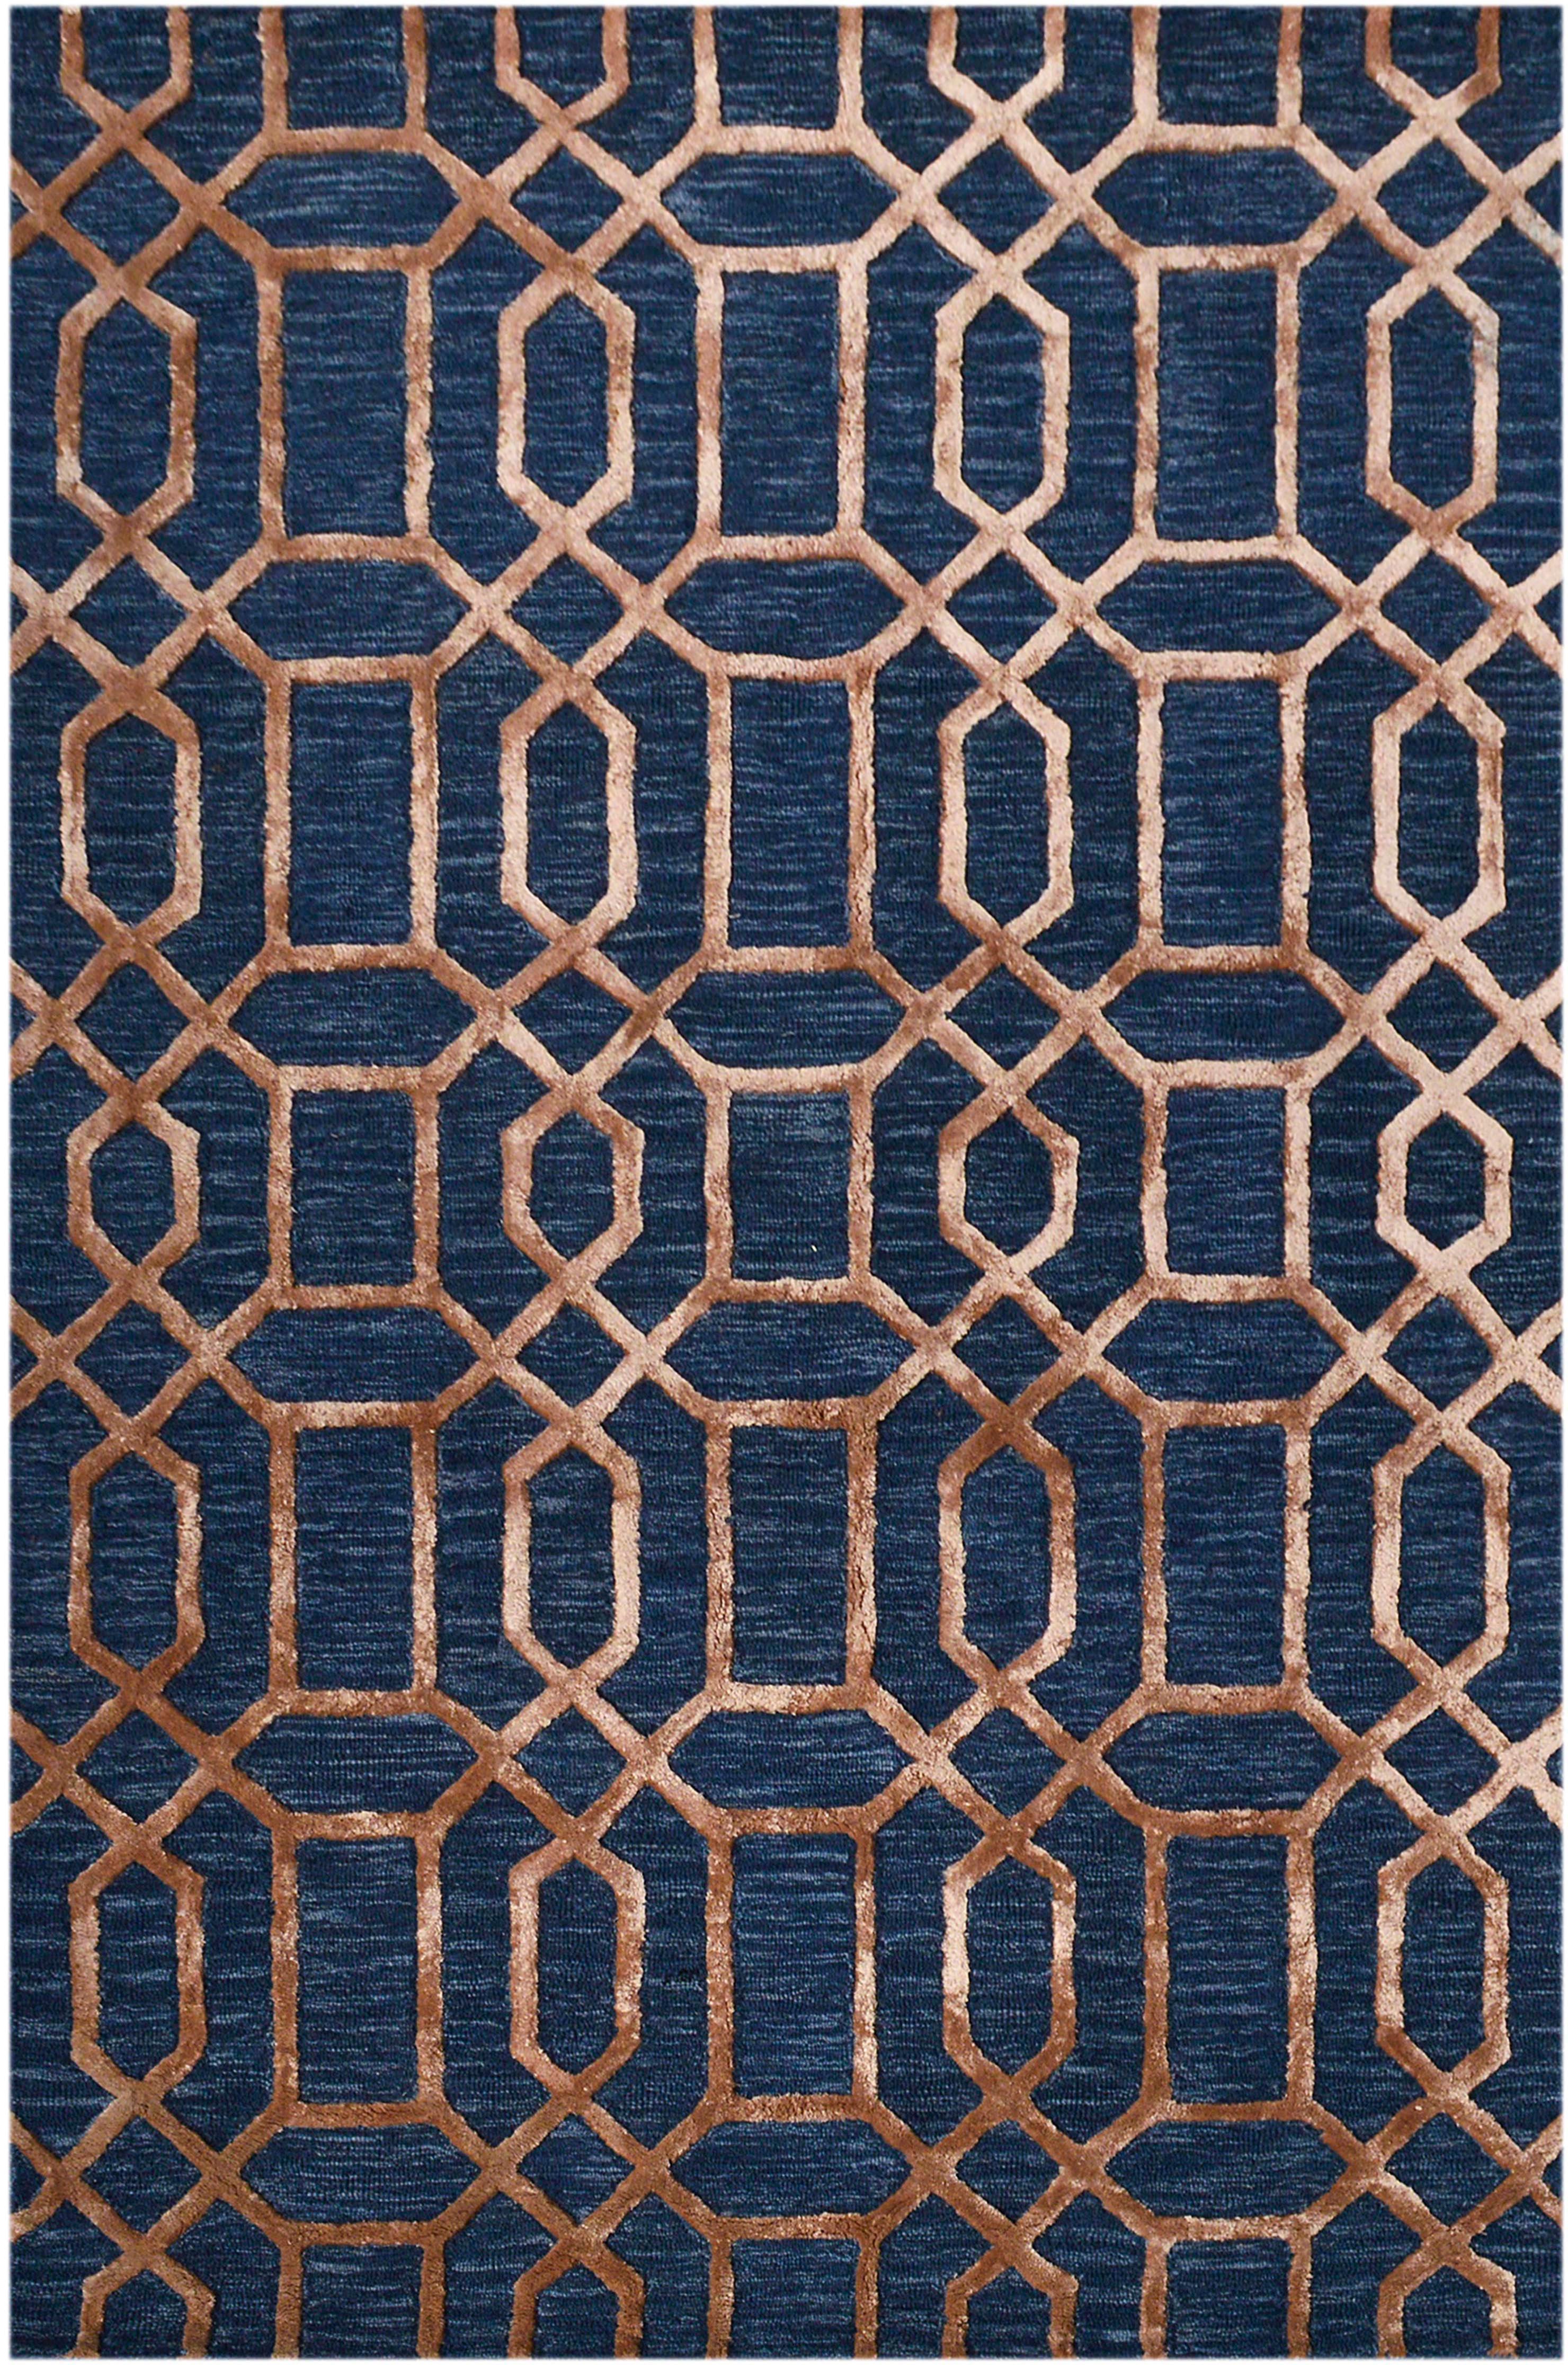 Alfombra artesanal de lana Vegas, Parte superior: 80%lana, 20%viscosa, Reverso: algodón, Azul oscuro, marrón, An 200 x L 300 cm (Tamaño L)